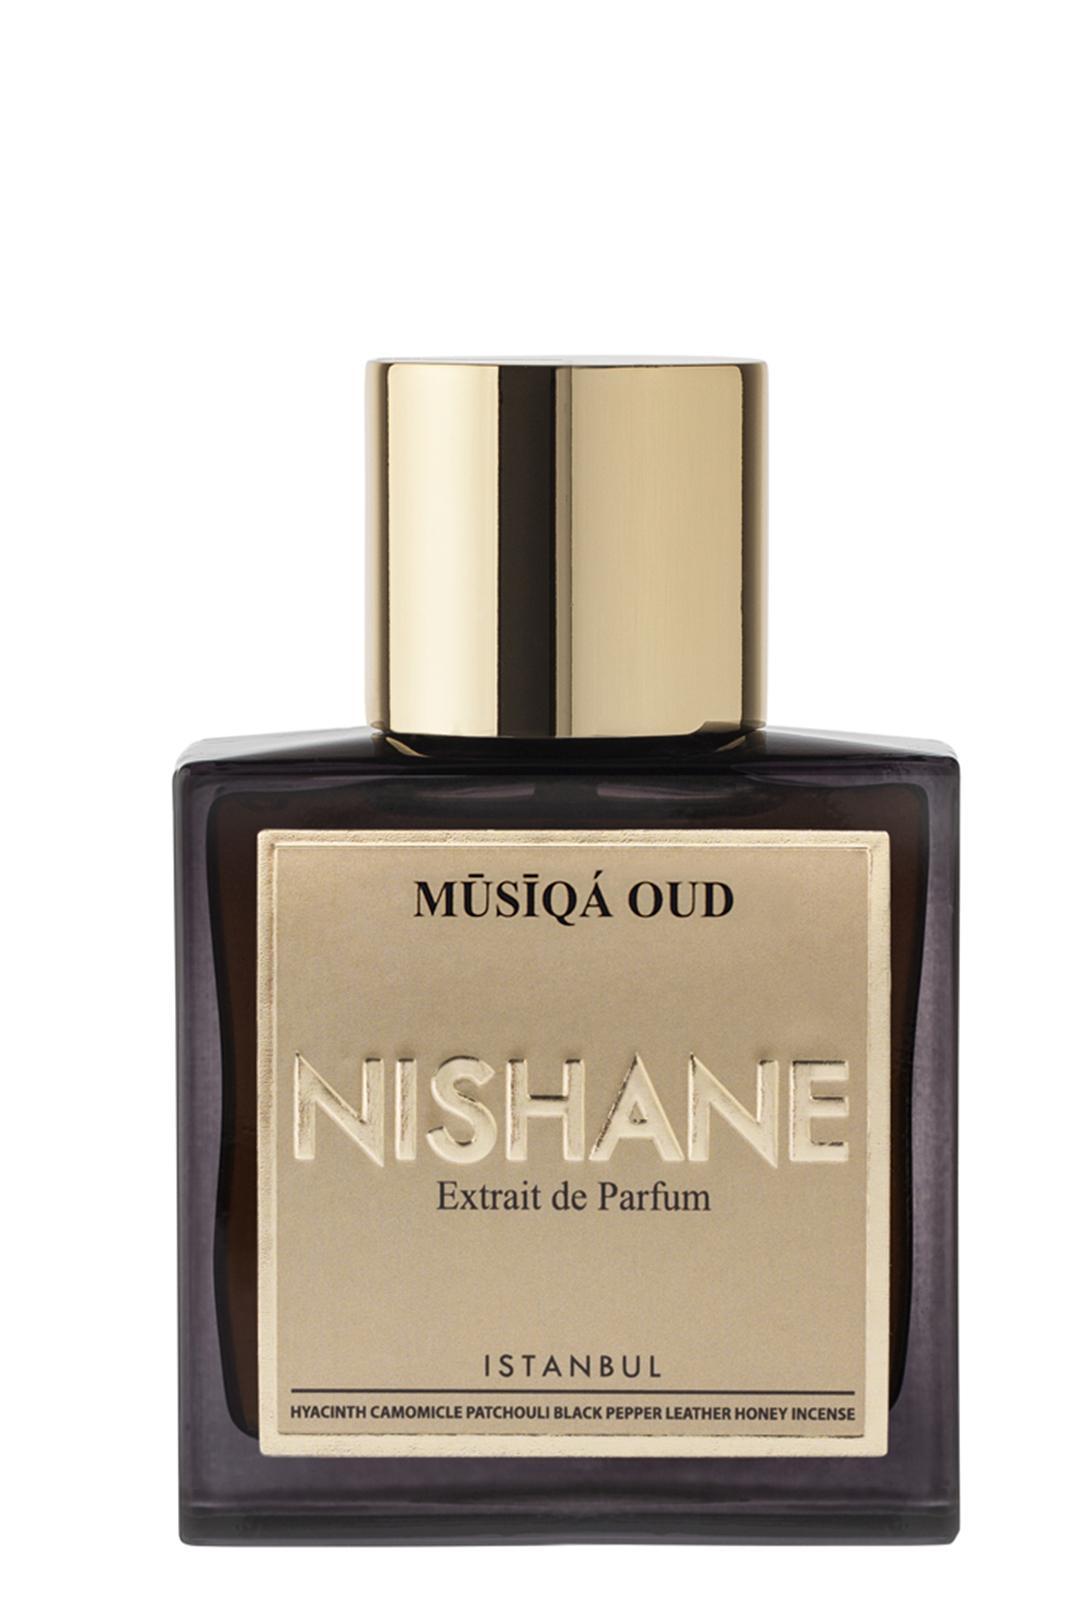 Nishane Istanbul Musiqa Oud Extrait De Parfum 50 ml In Brown